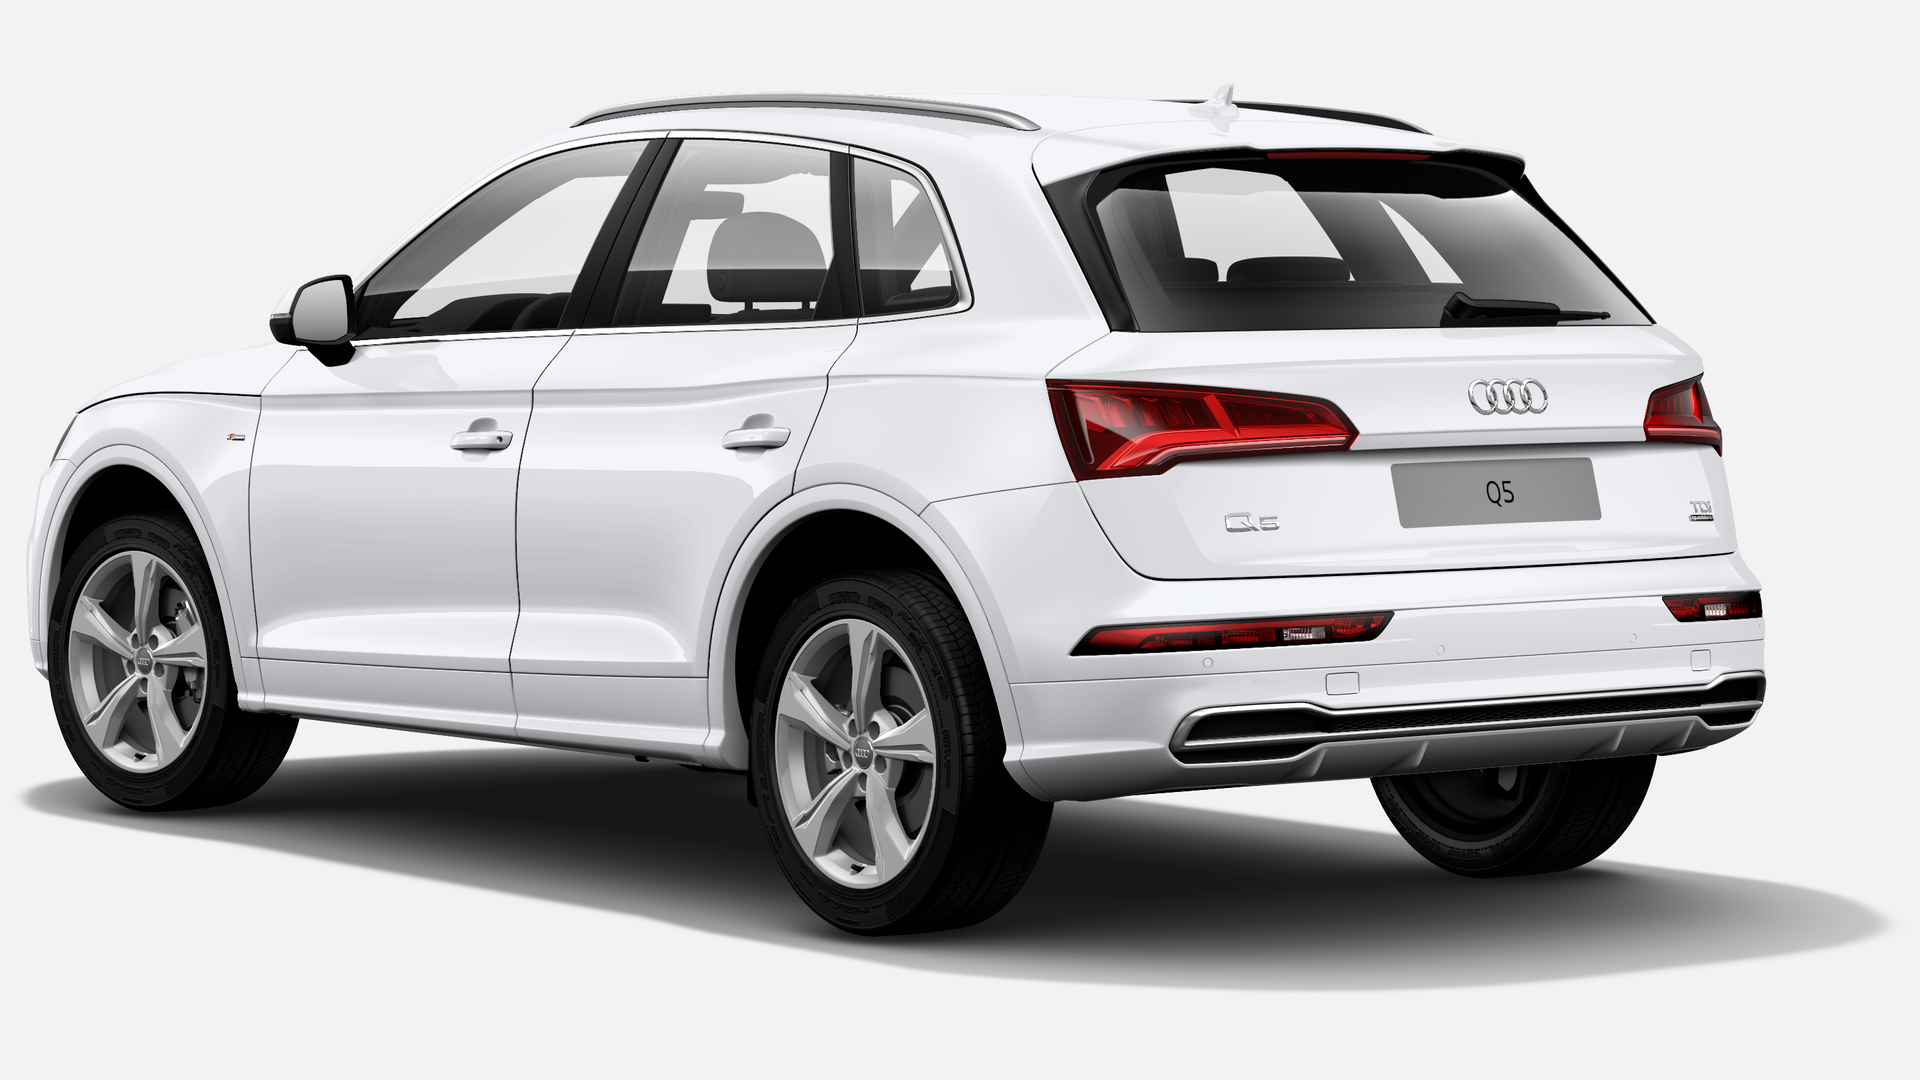 Vista Tres cuartos trasera izquierda de Audi Q5 40 TDI S Line Quattro S Tronic 140 kW (190 CV)